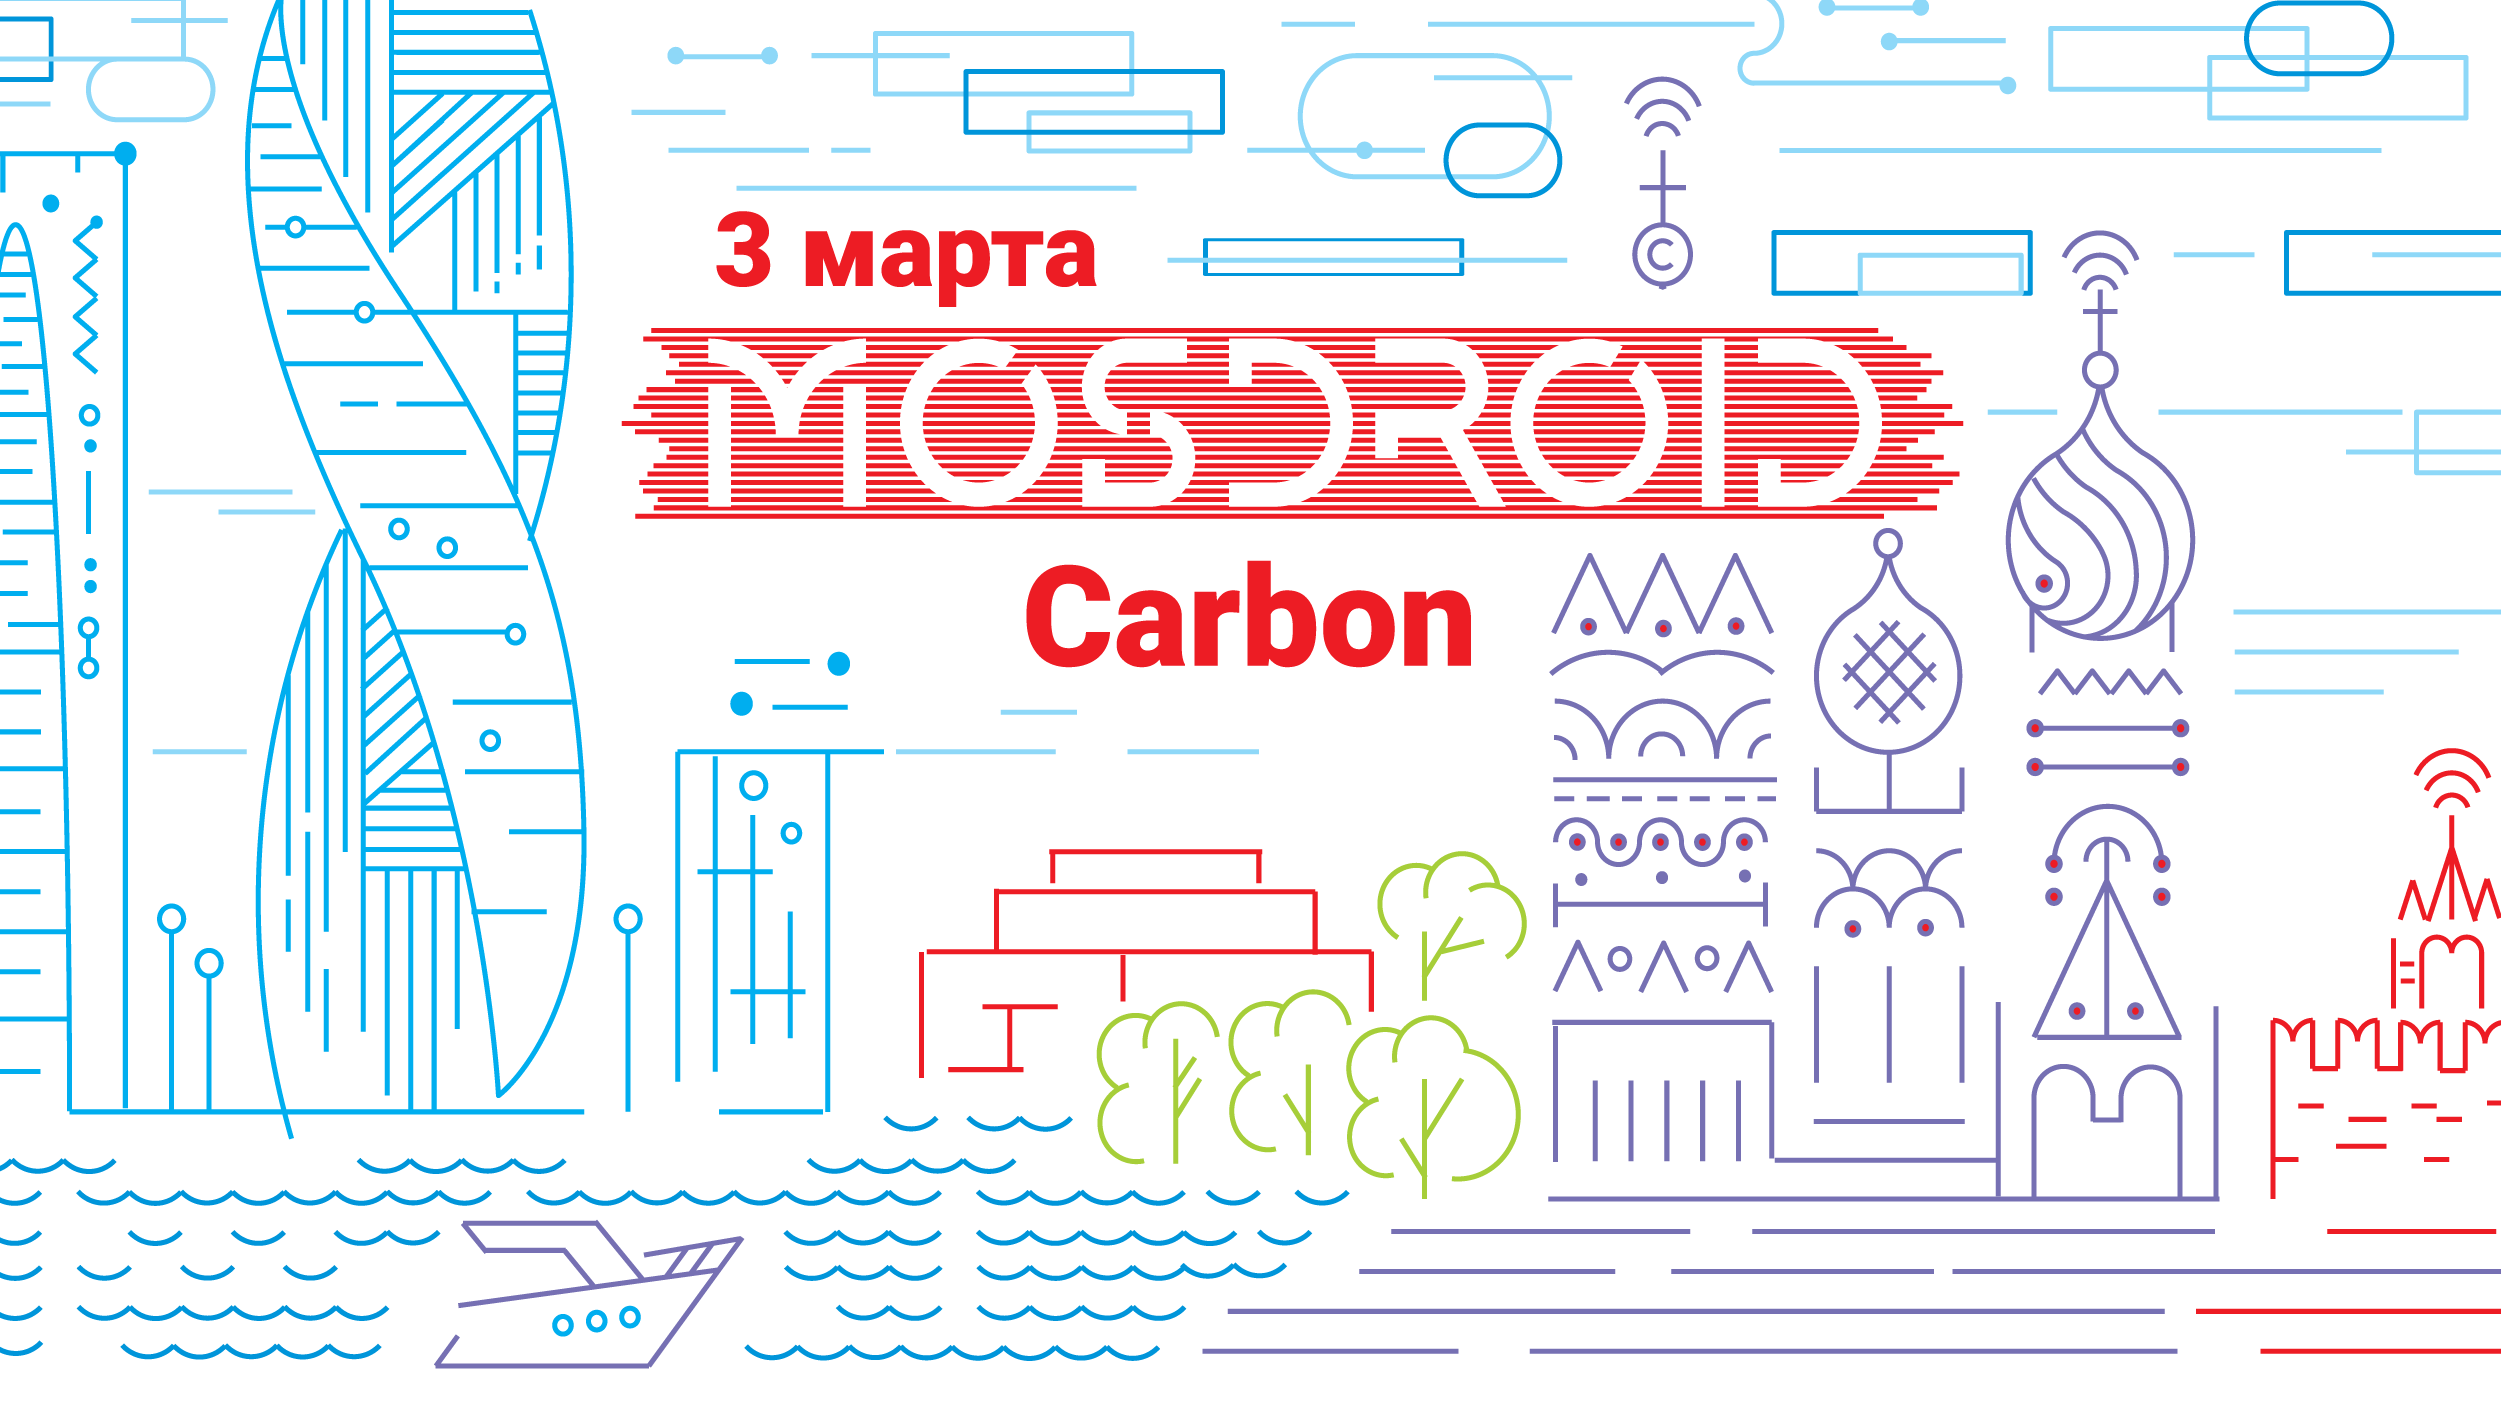 MOSDROID #6 Carbon